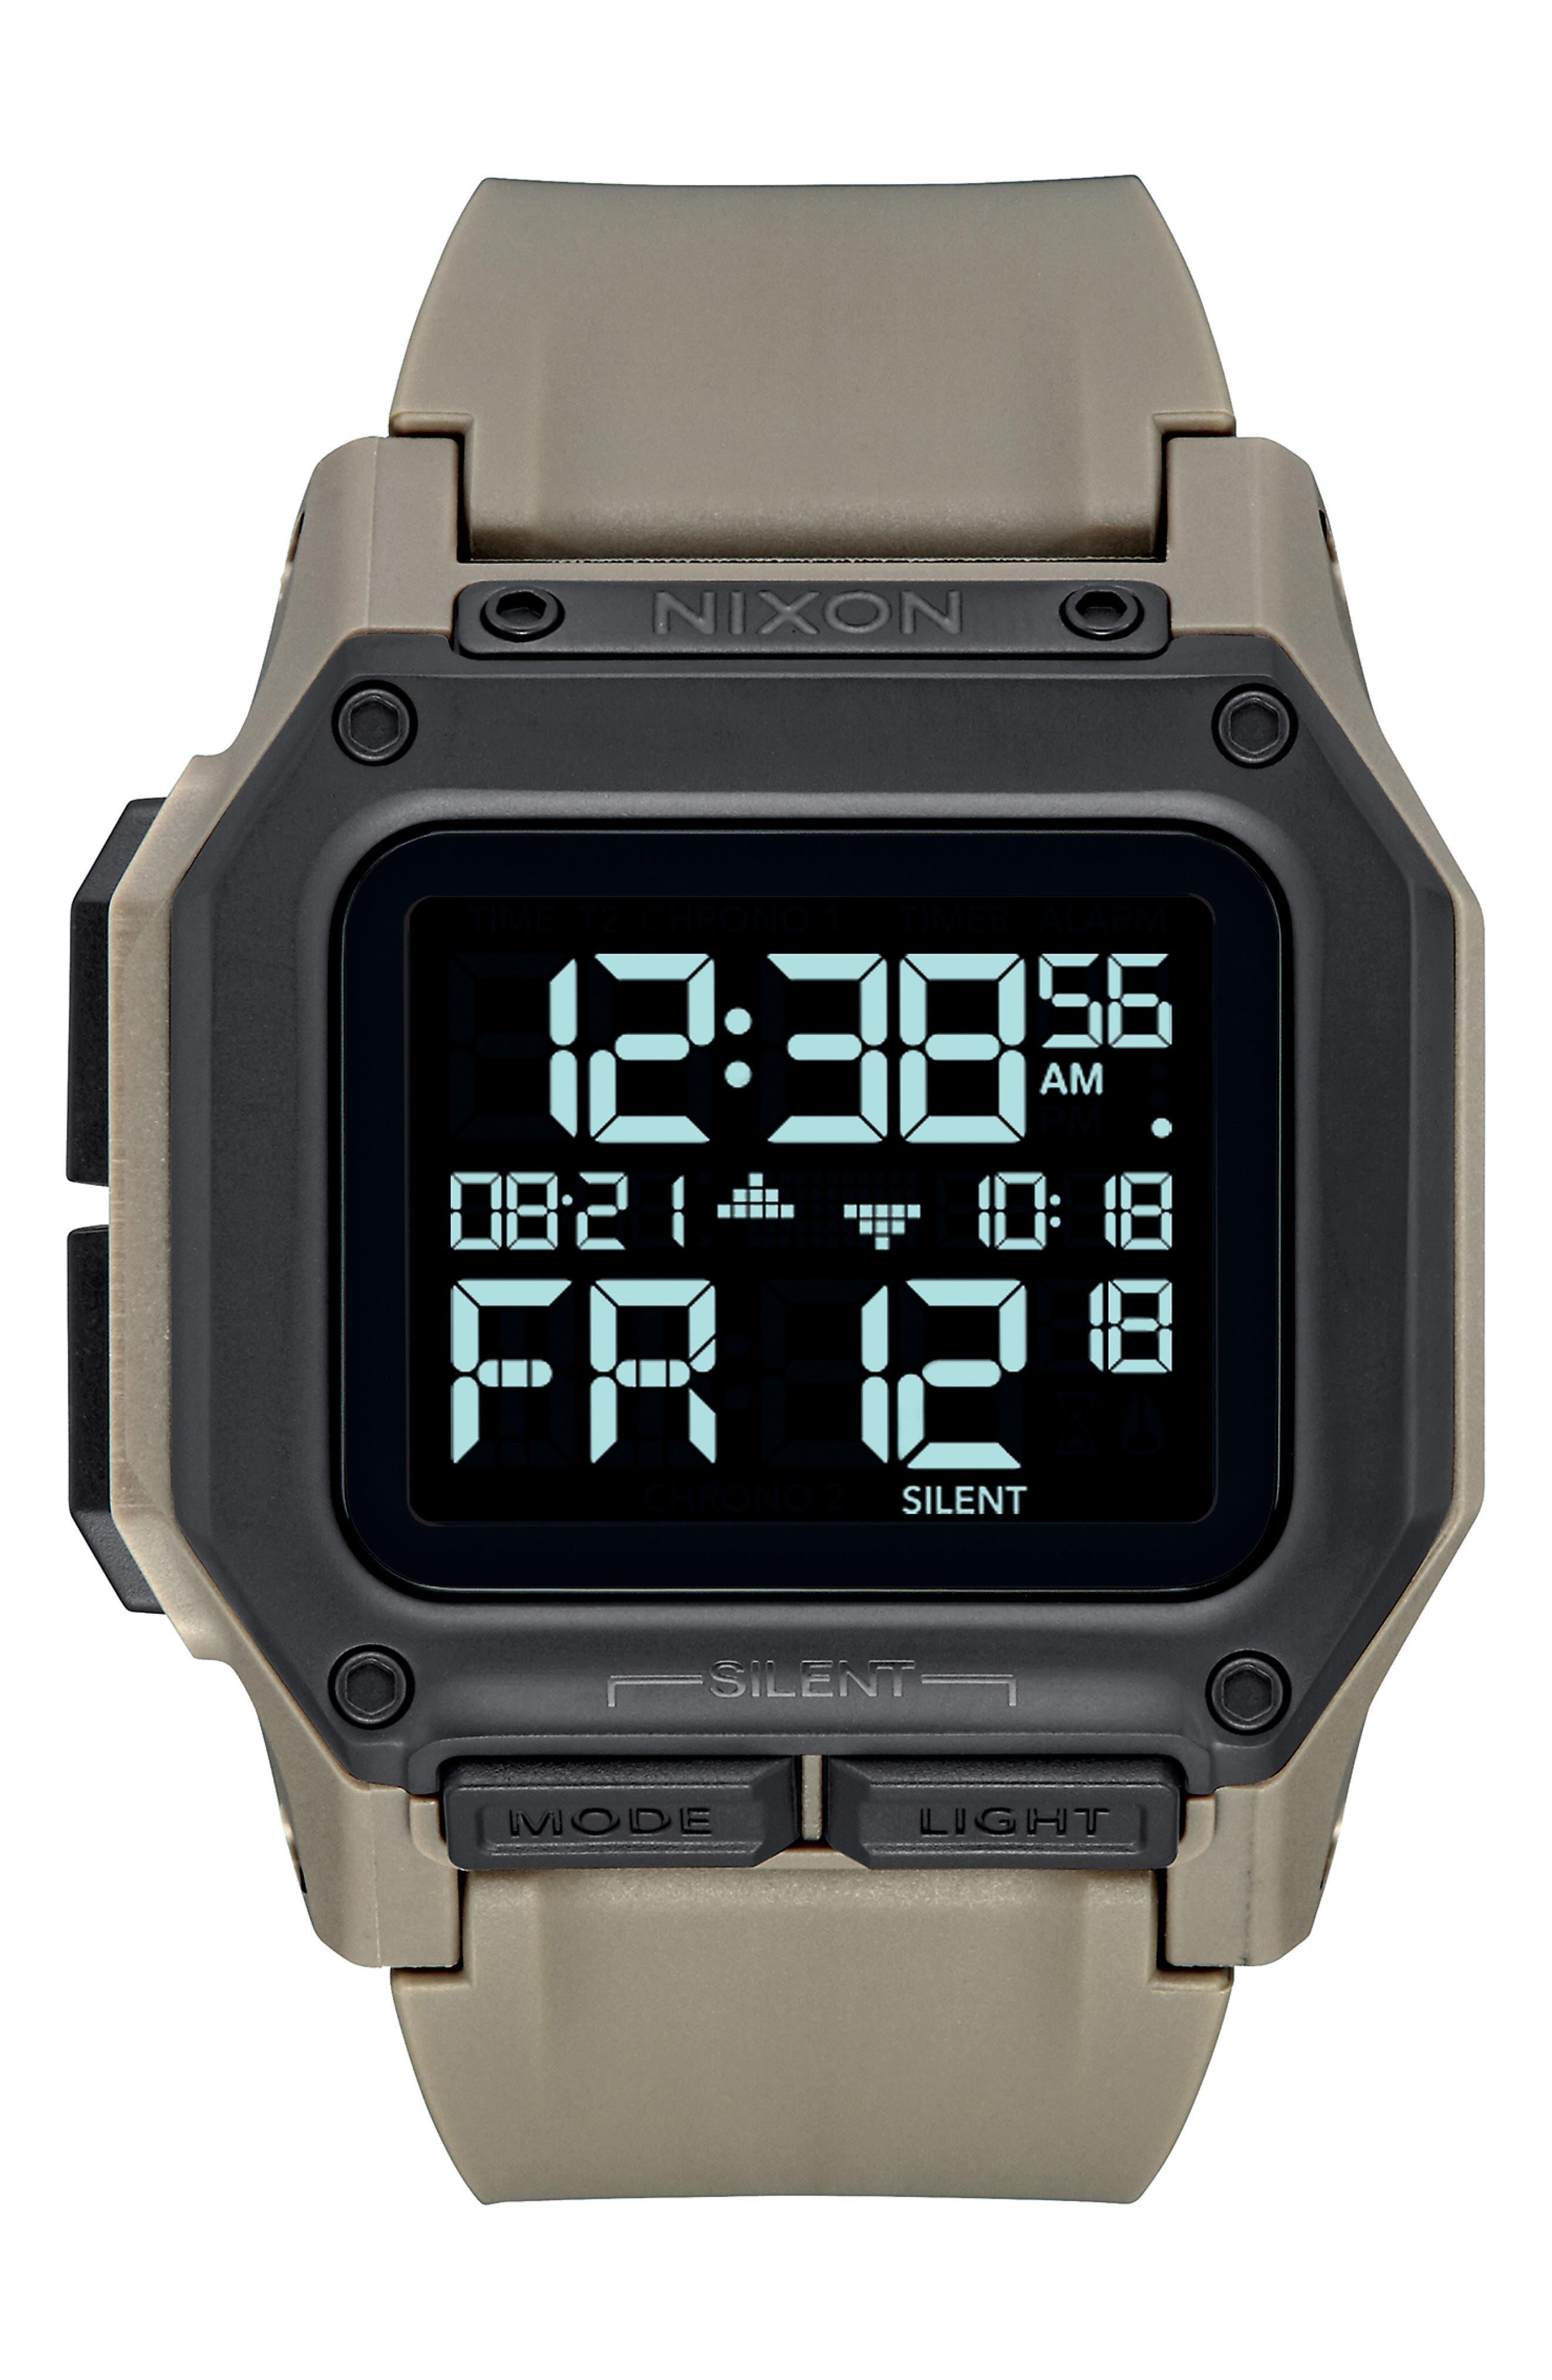 NIXON Regulus Beige Watch, 44Mm X 46Mm in Sand/ Black/ Sand